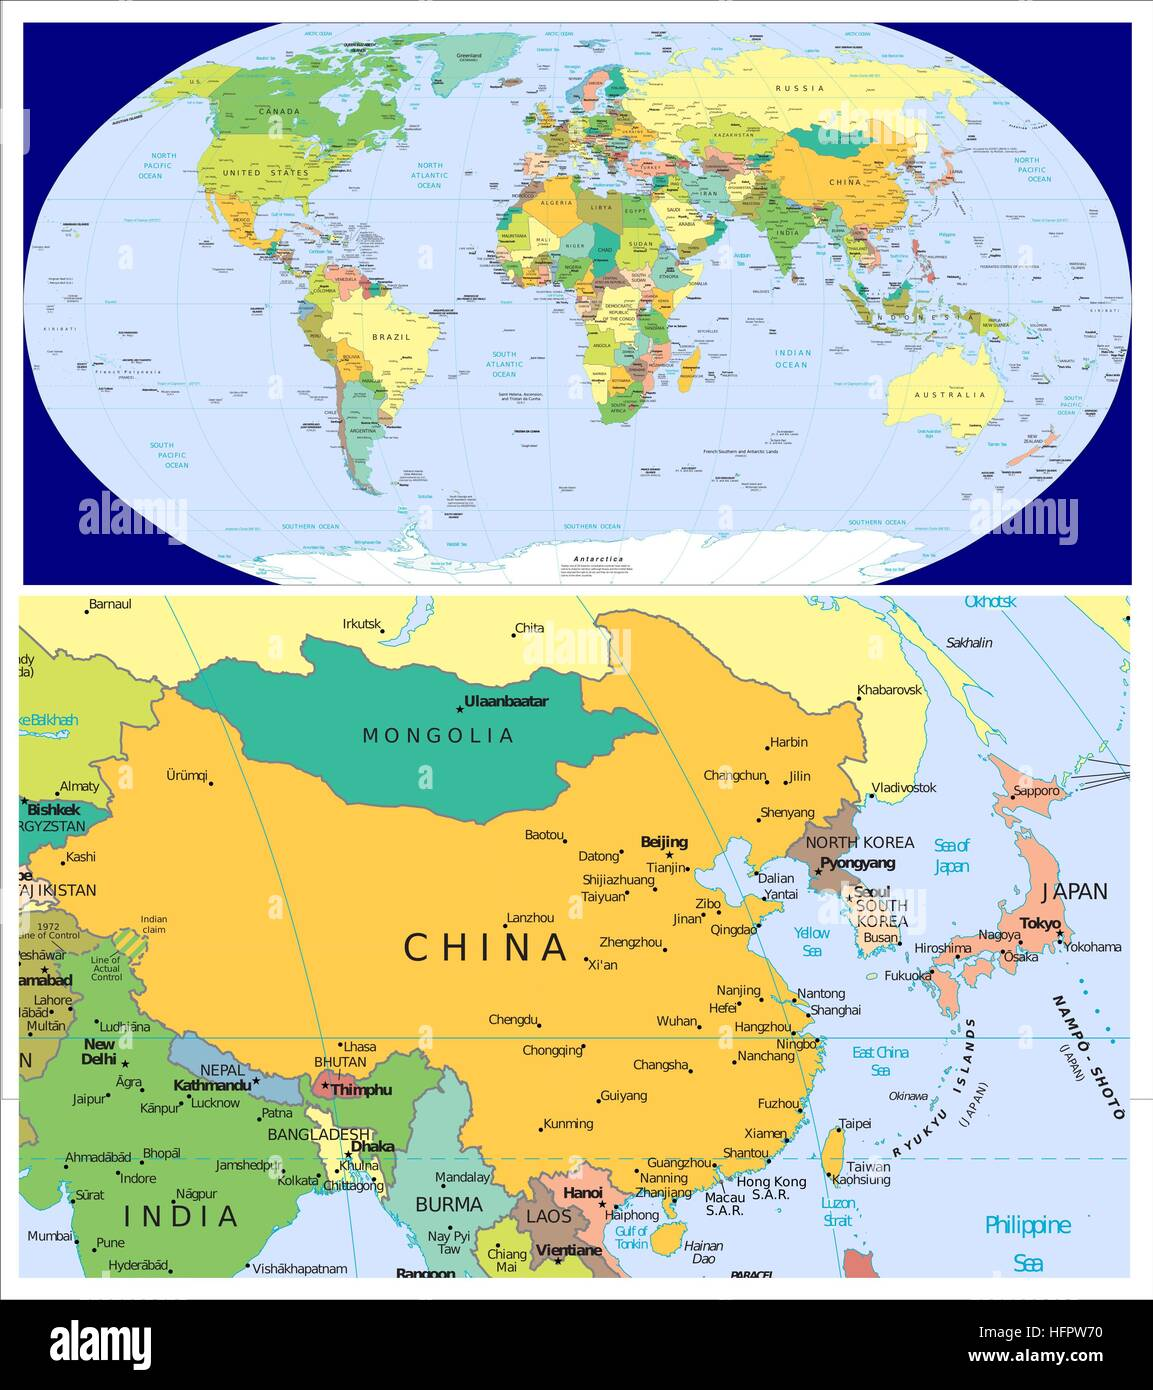 China japan n korea s korea mongolia world stock photo 130195156 china japan n korea s korea mongolia world gumiabroncs Images